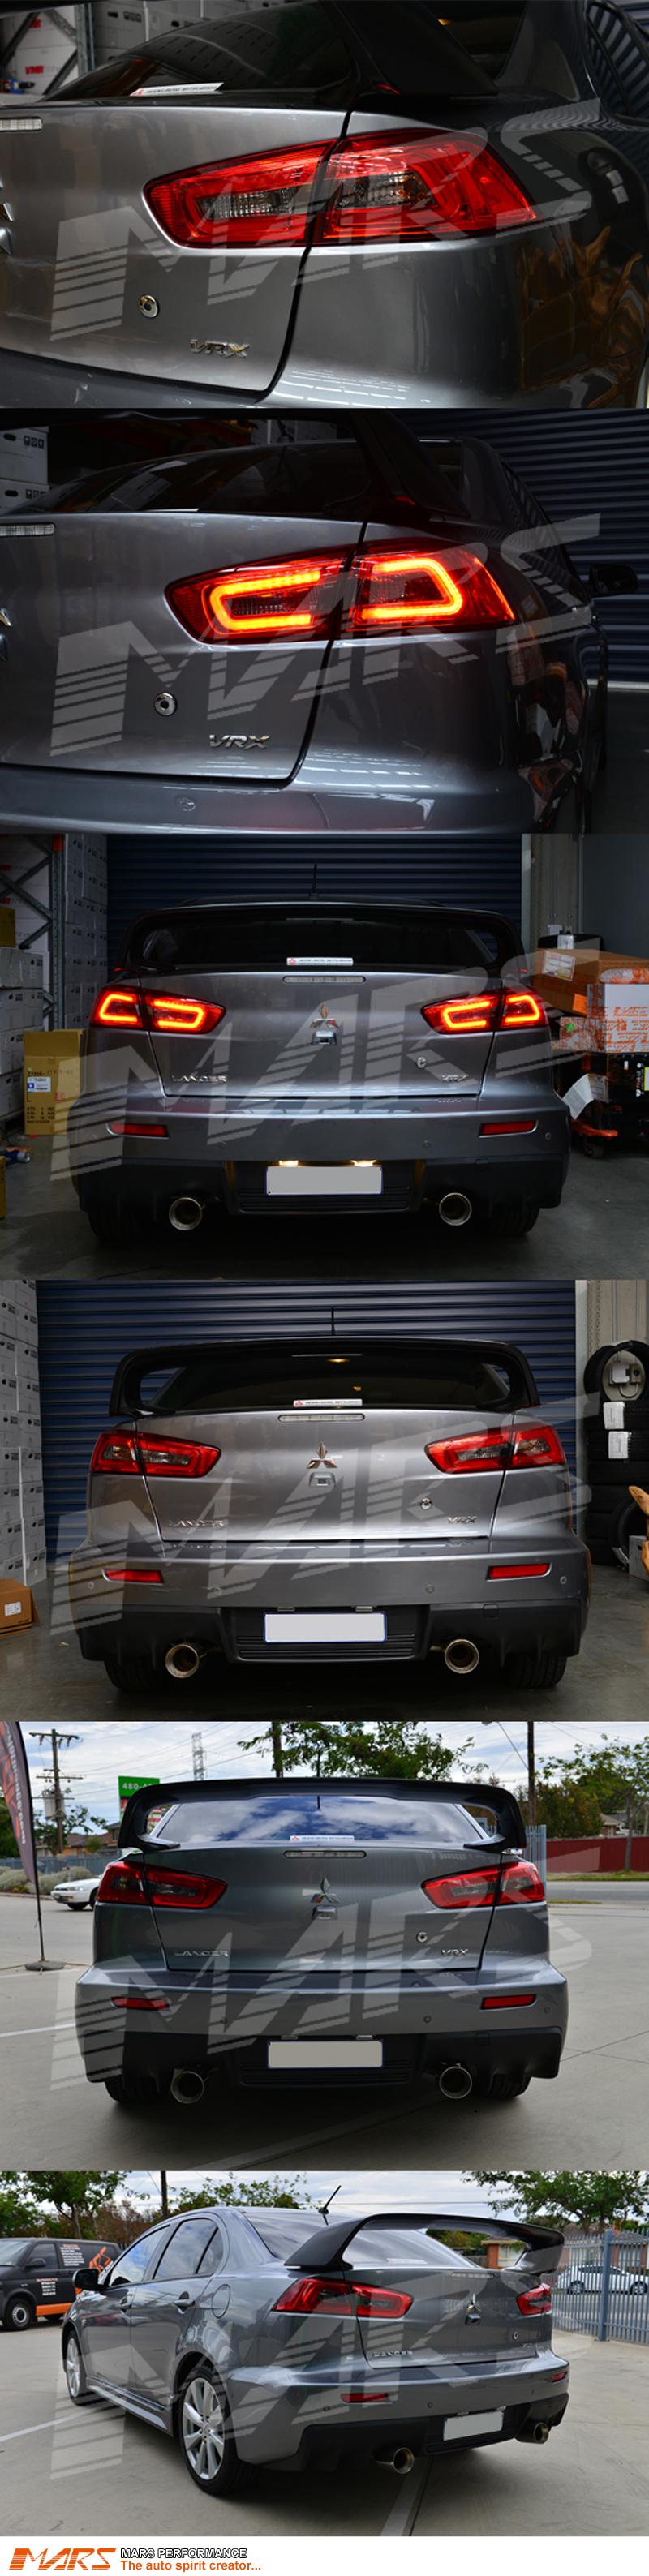 JDM Varis Smoked Red 3D LED Tail lights for Mitsubishi Lancer CJ & EVO X Sedan 07-15   Mars Performance